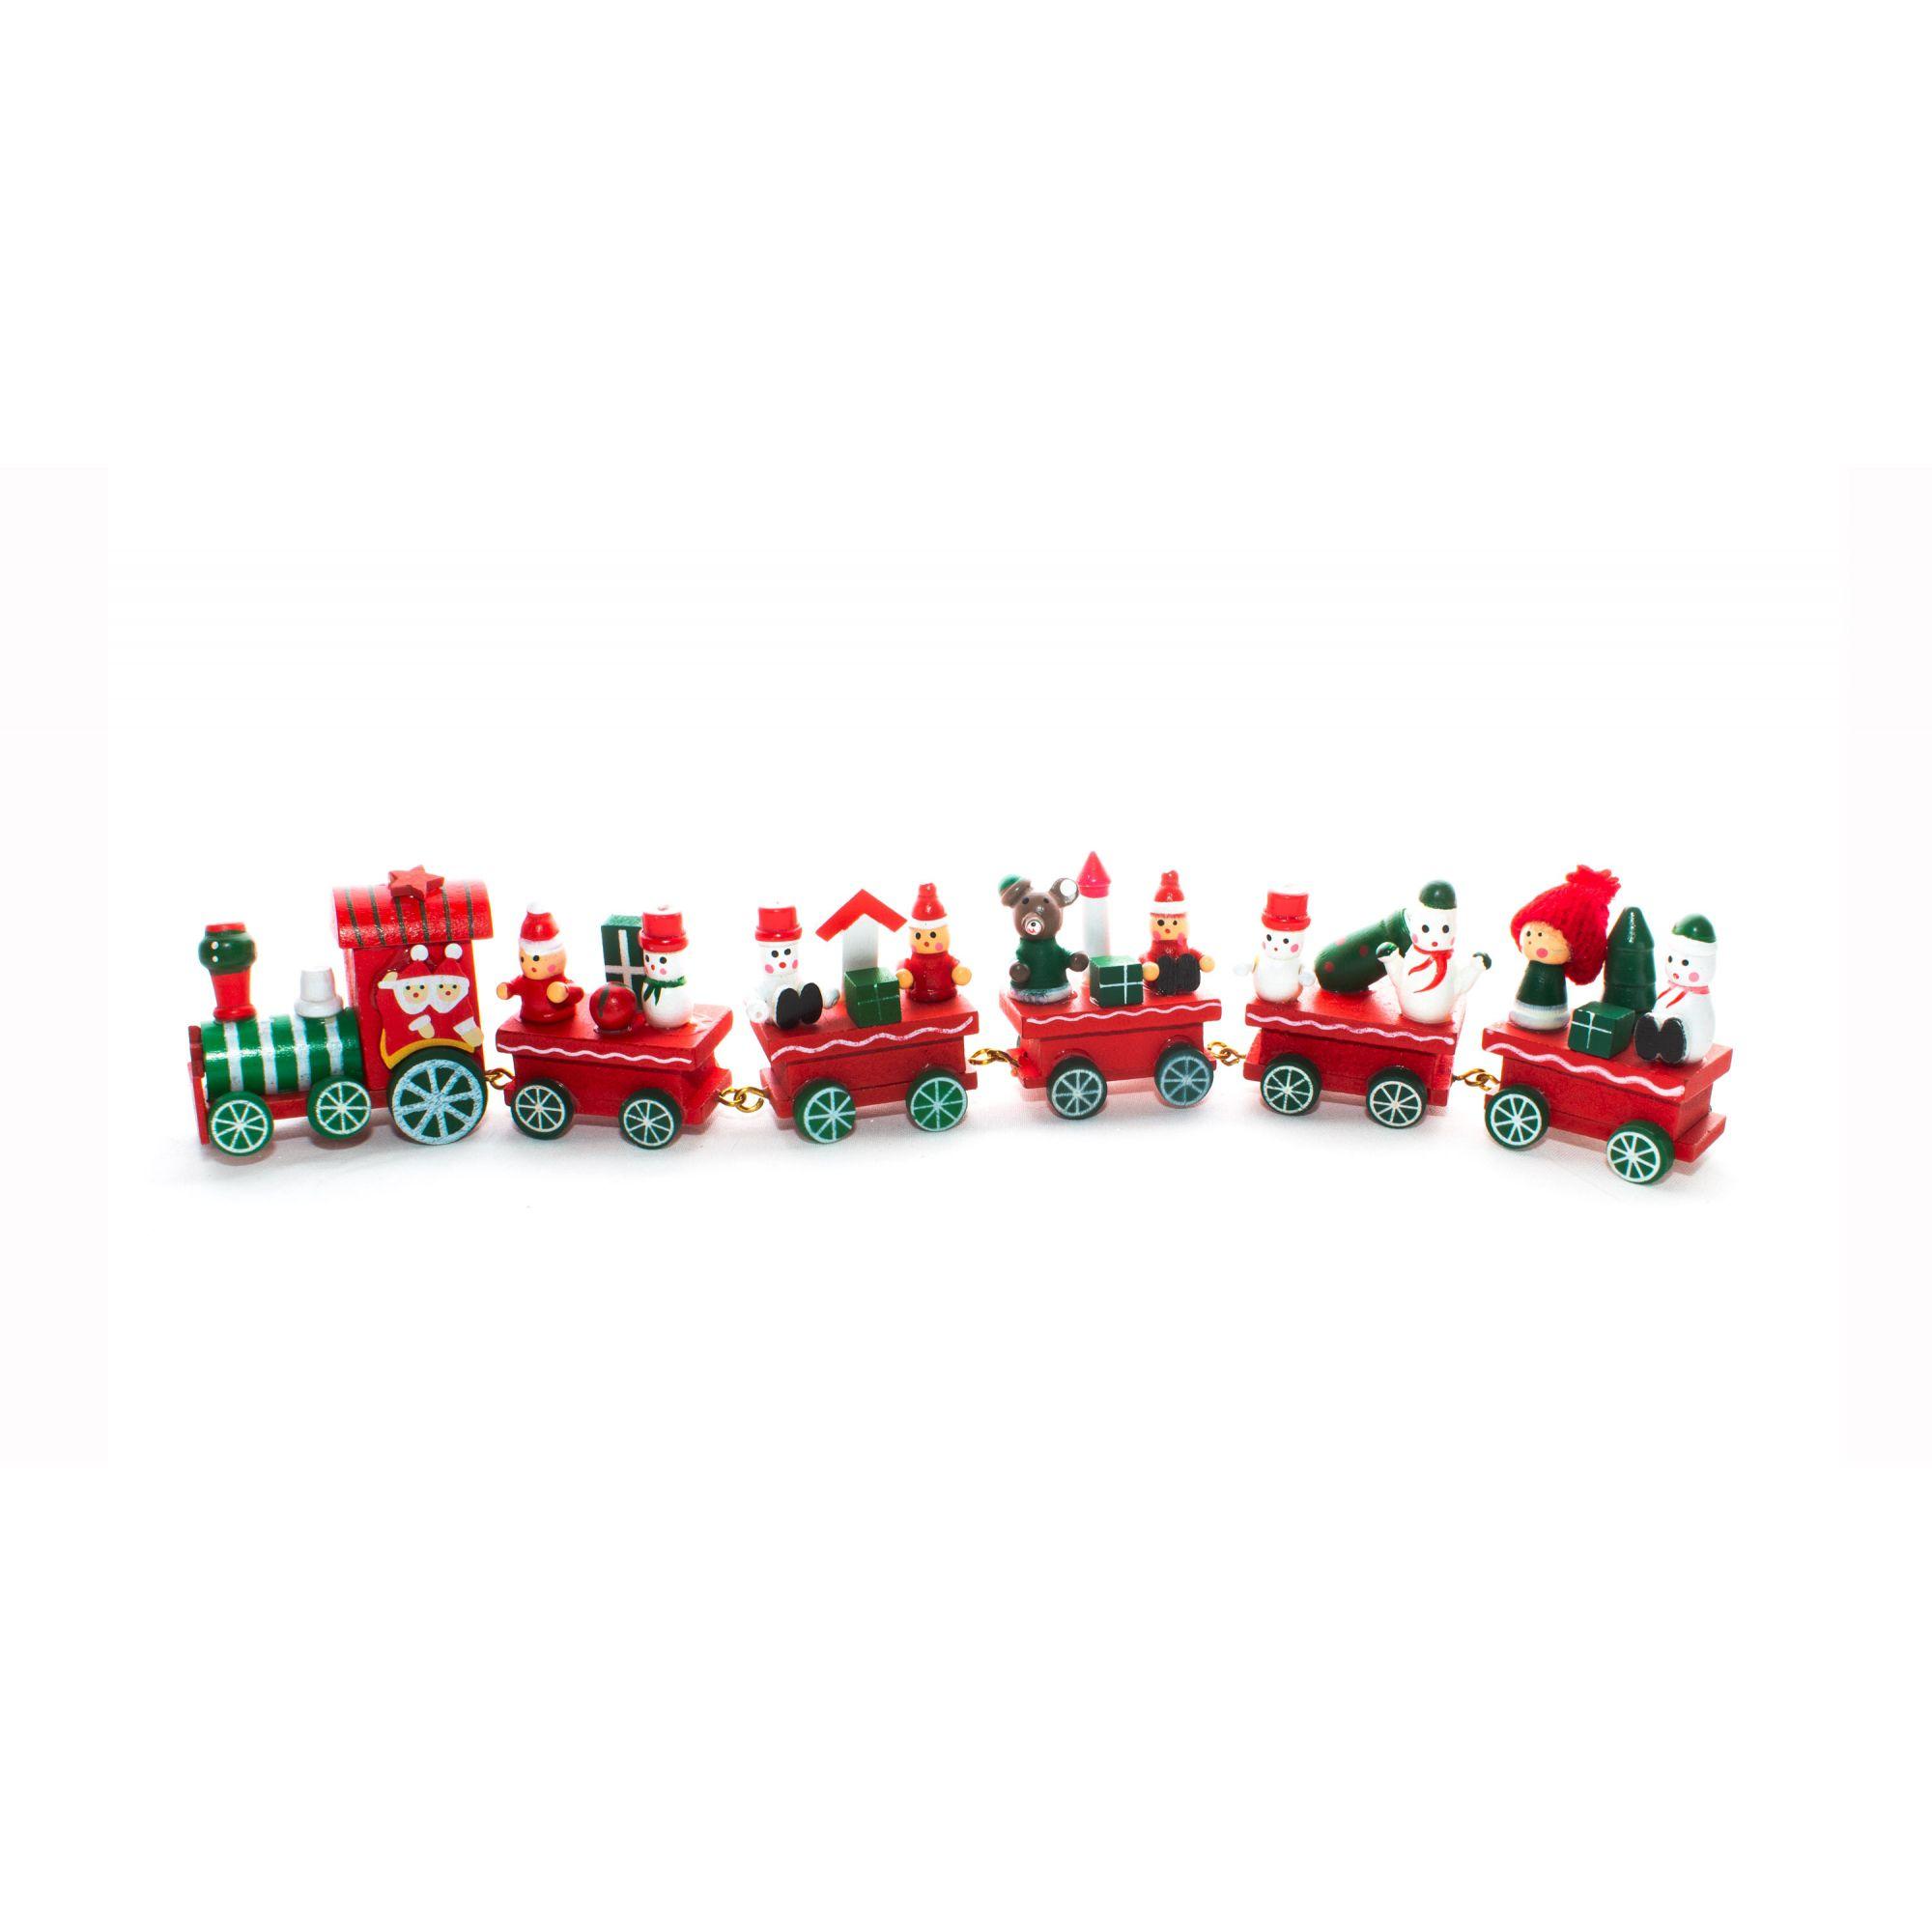 Trem Do Papai Noel - 31 Cm Largura